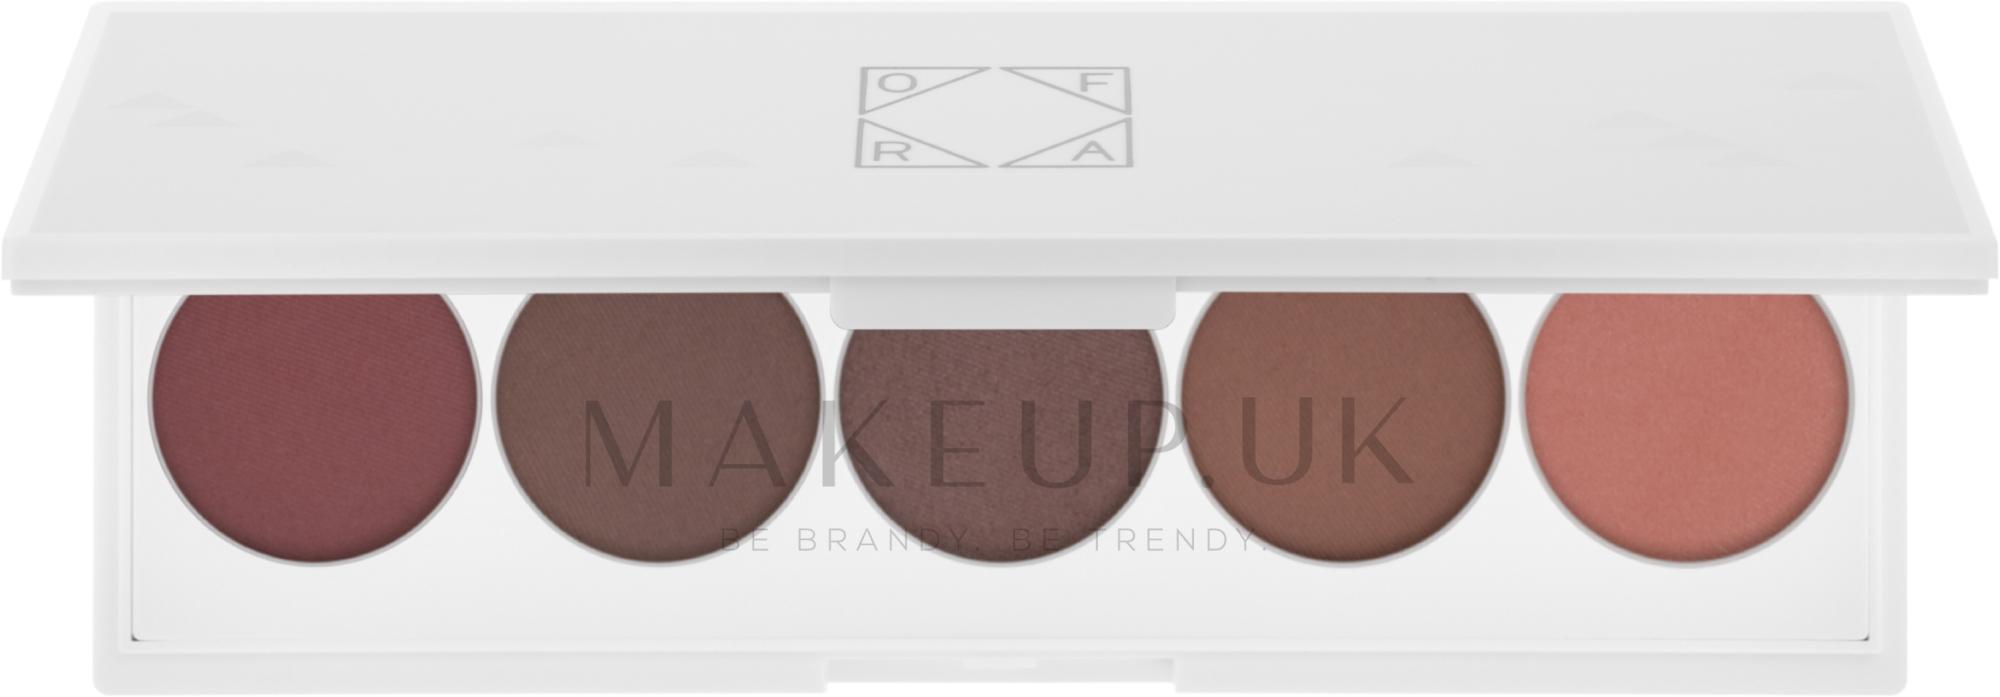 Eyeshadow Palette - Ofra Signature Palette Contour Eyes — photo 10 g